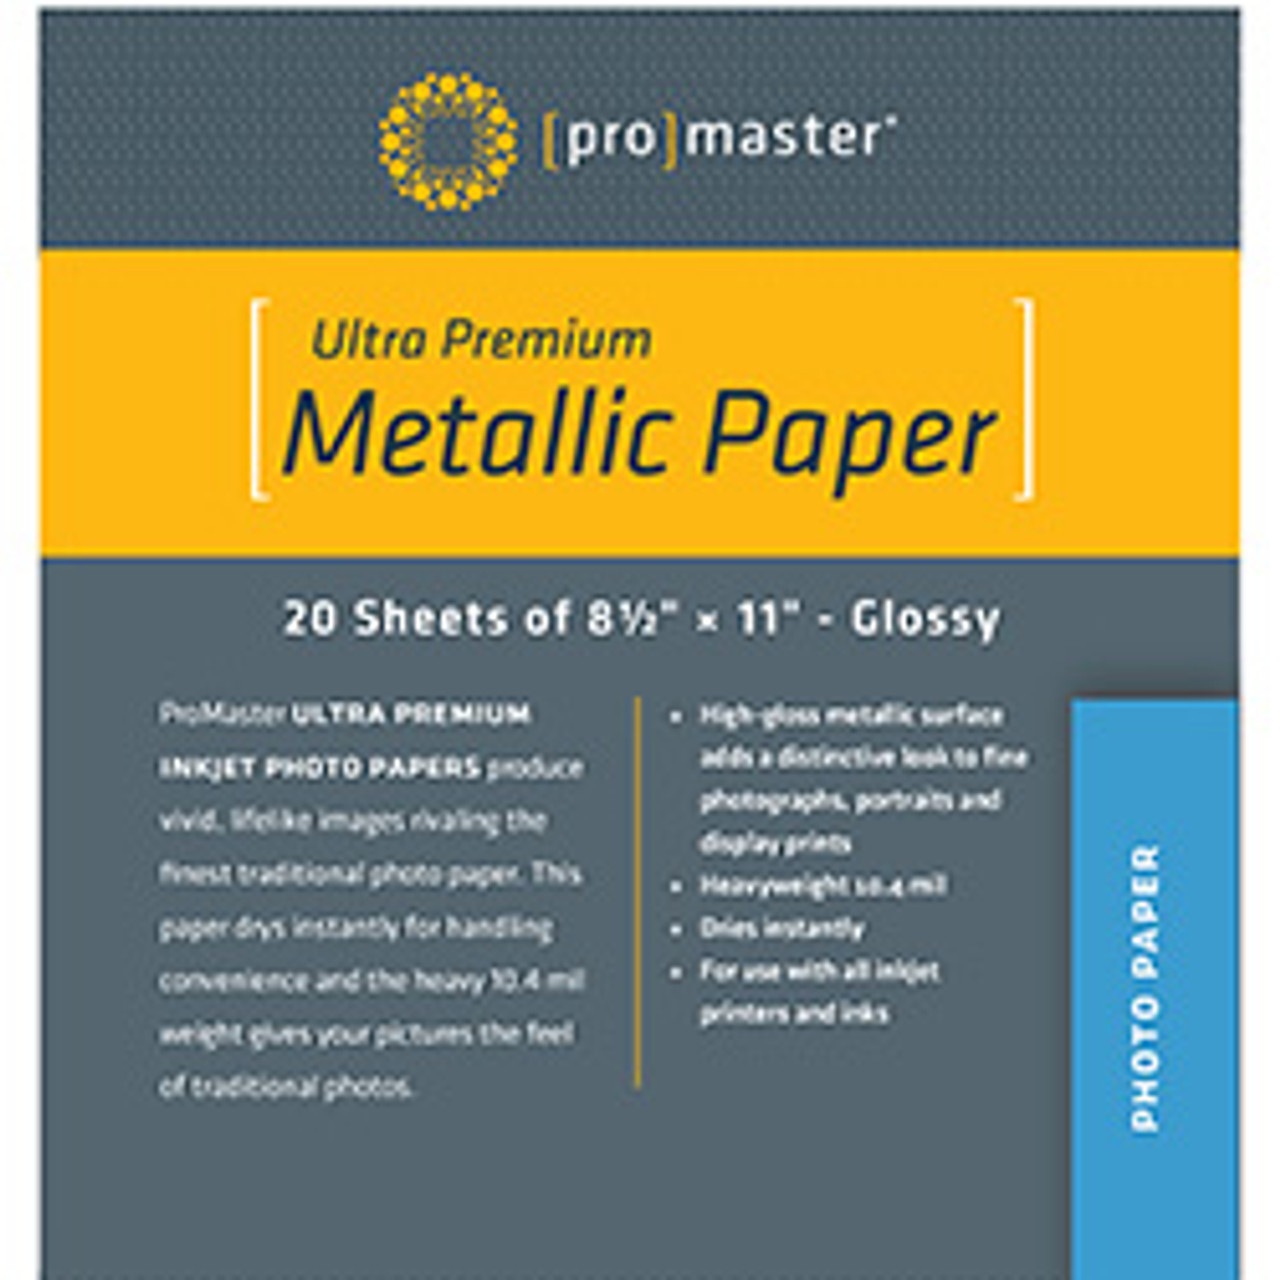 ProMaster Ultra Premium Metallic Paper - 8.5 x 11'' (20 sheets)